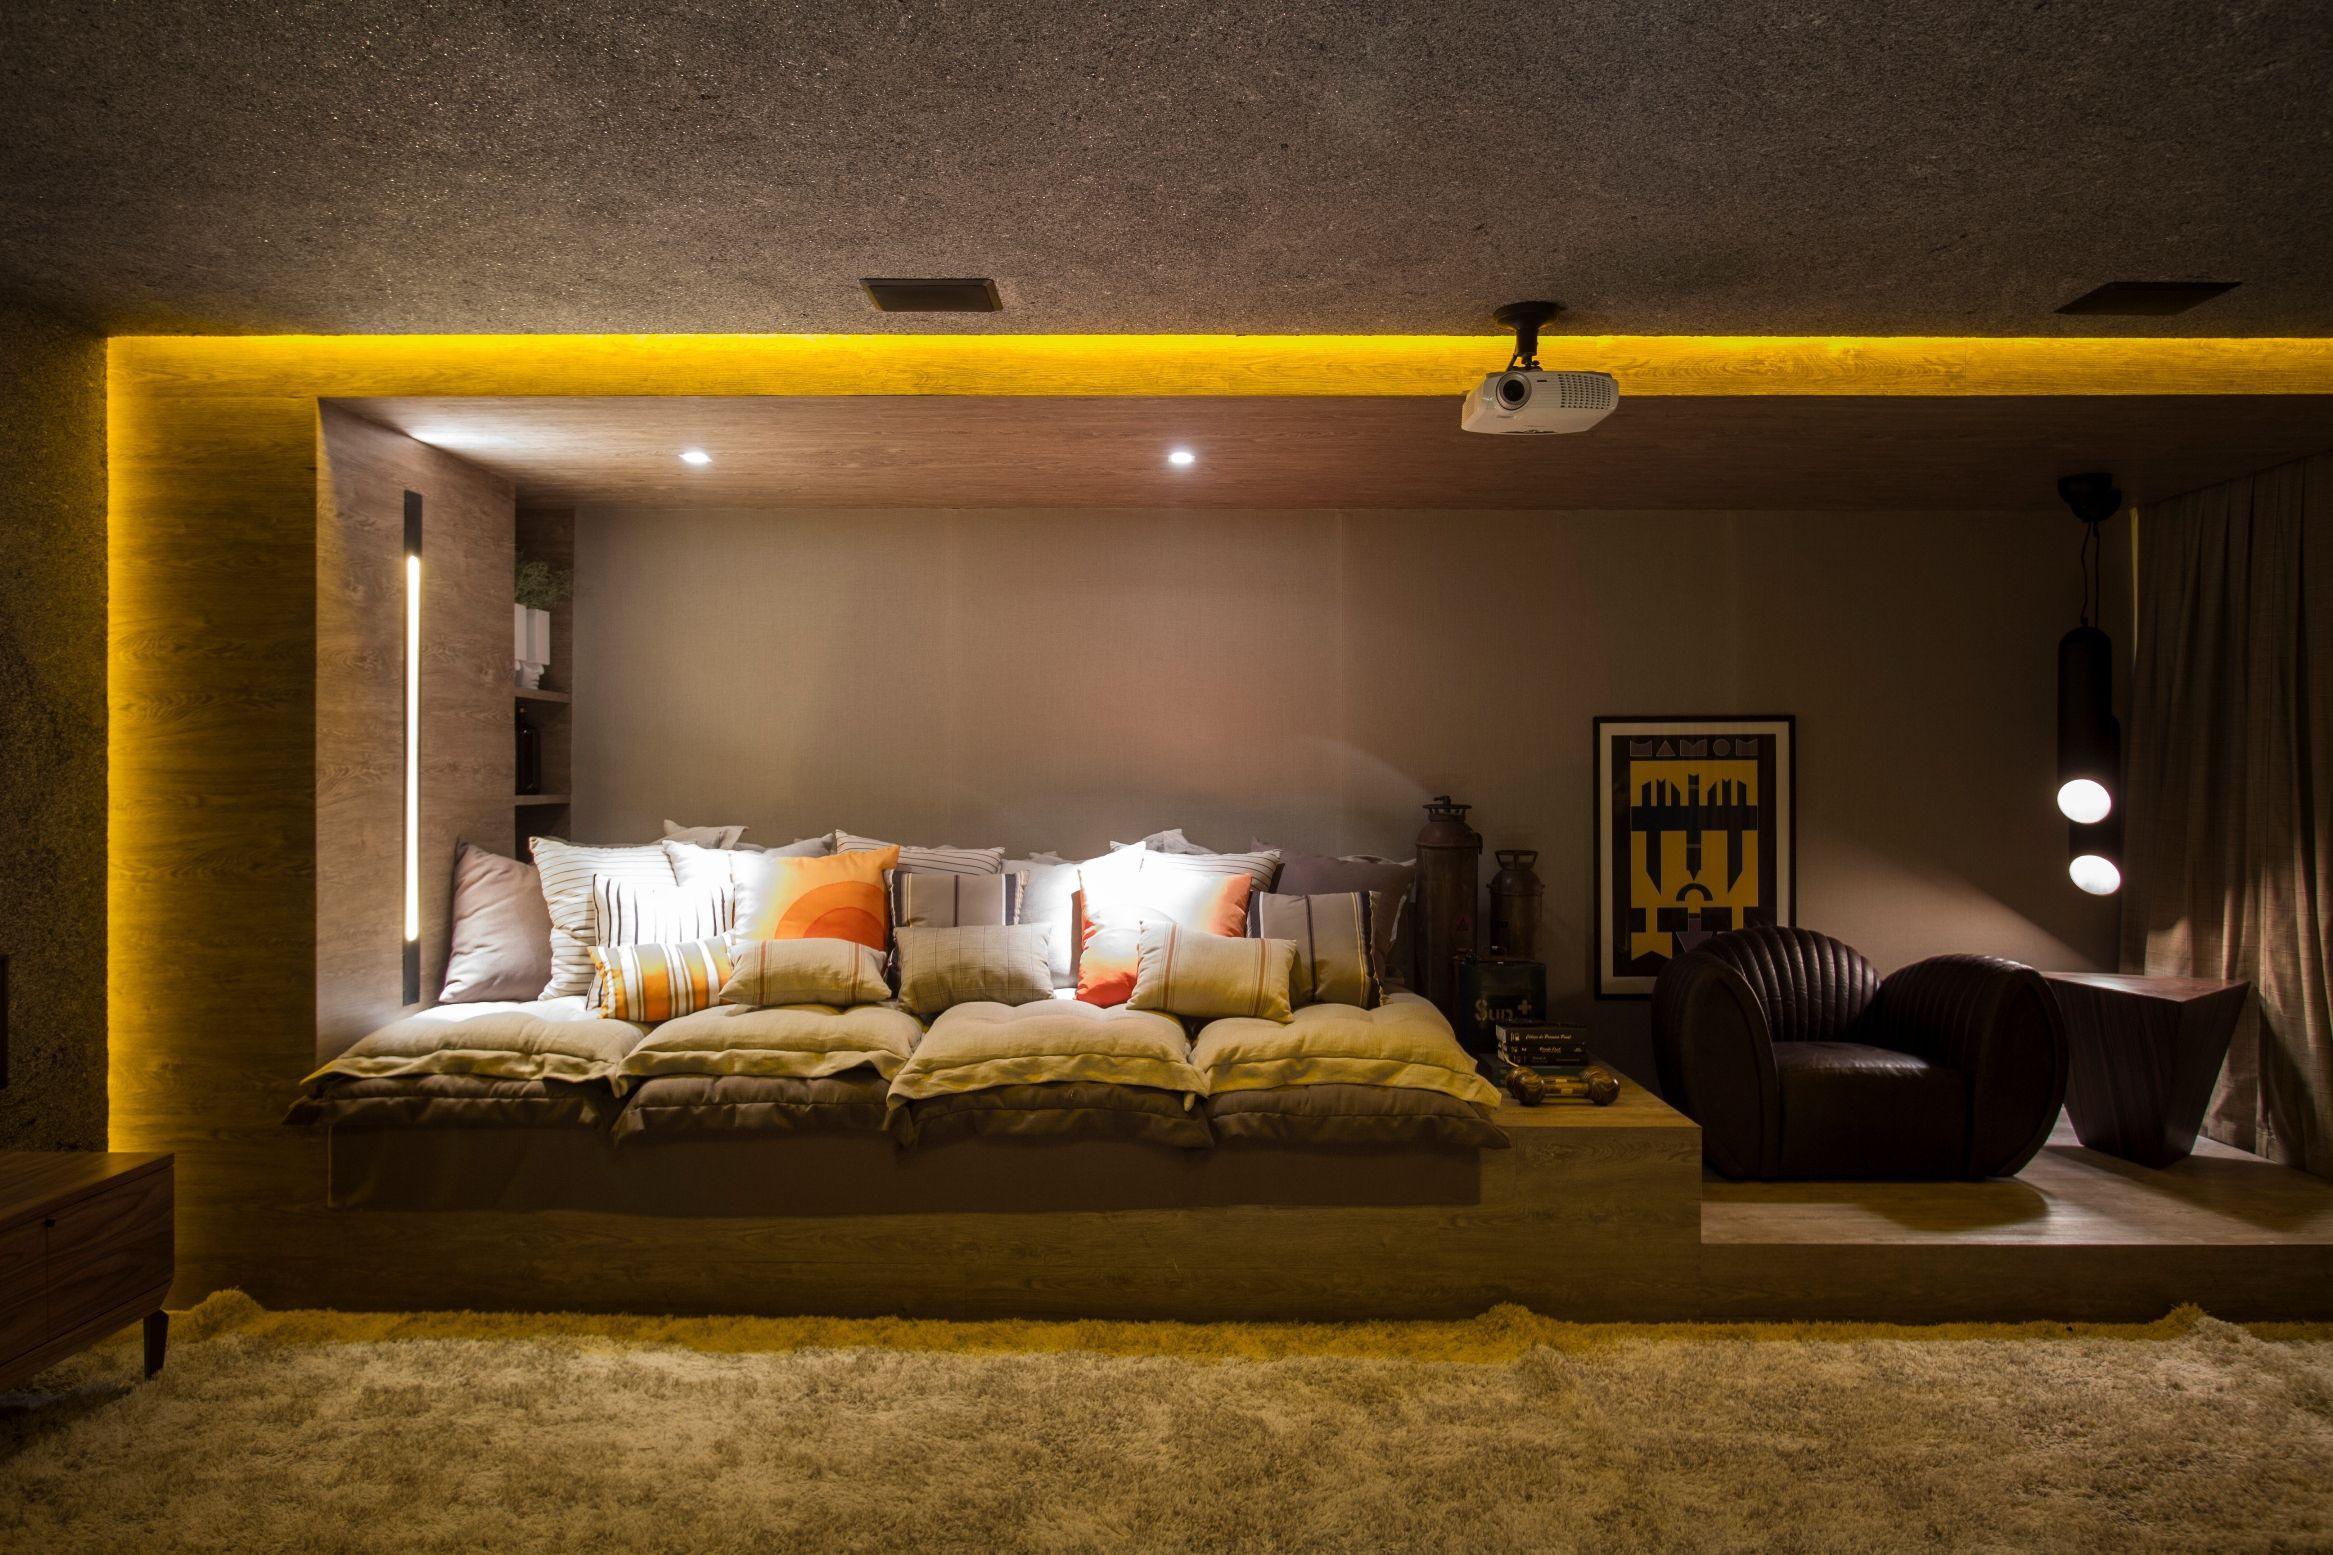 19 home theater renata dutra ambiente jpg 2333 1555 sala de tv